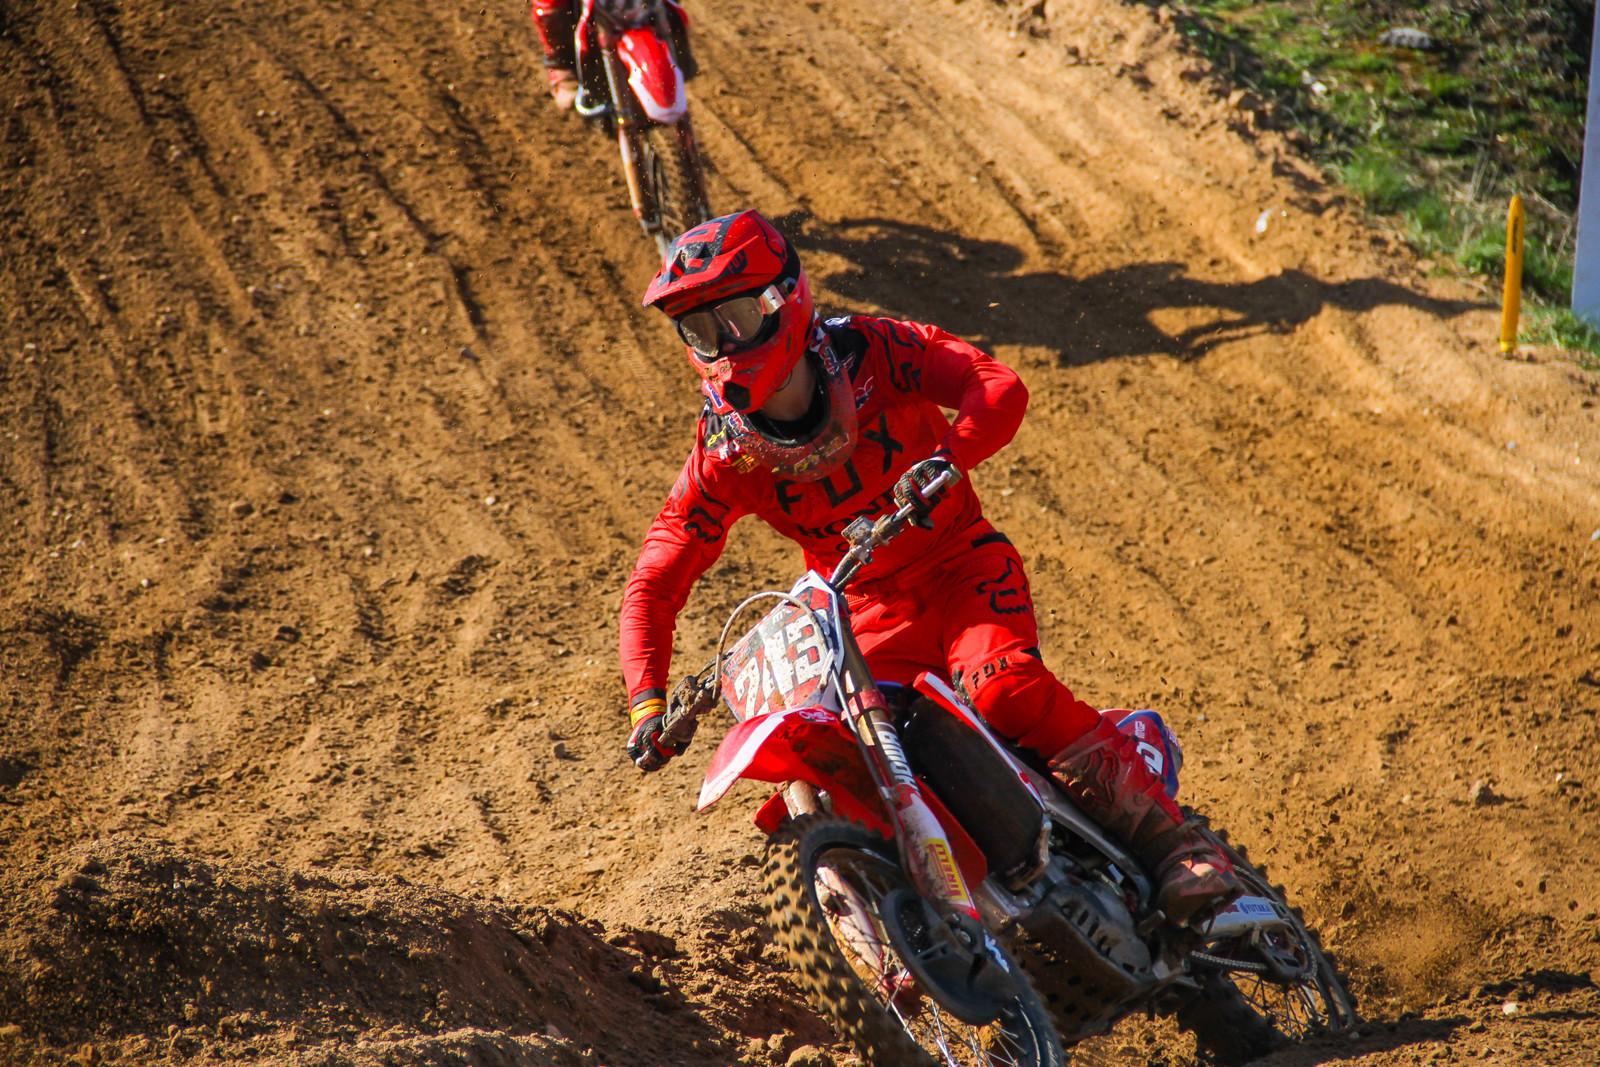 Tim Gajser - Photo Blast: 2017 MXGP of Latvia - Motocross Pictures - Vital MX